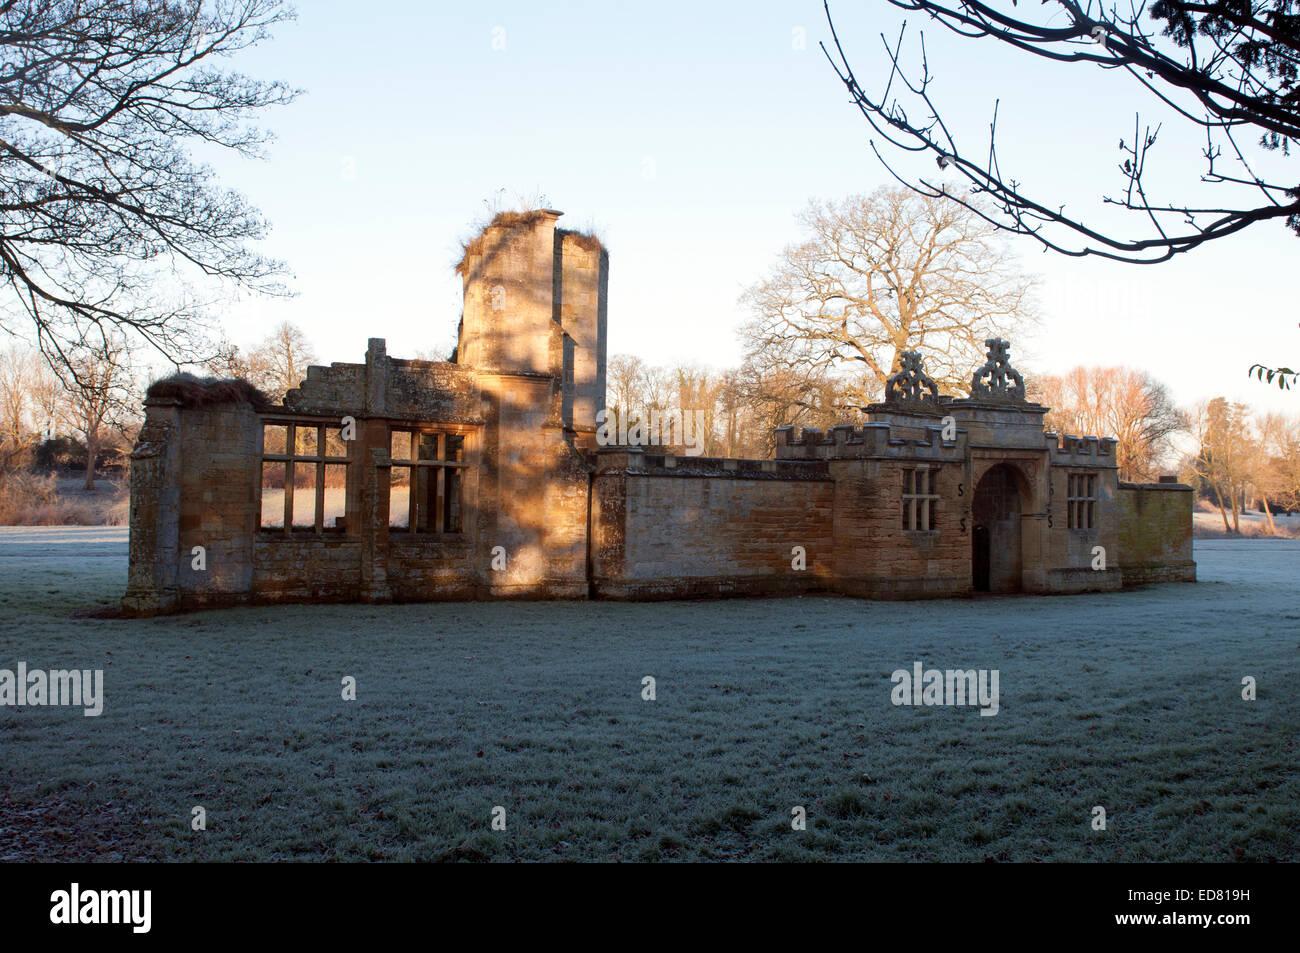 Gateway ruins, Toddington Manor, Gloucestershire, England, UK - Stock Image